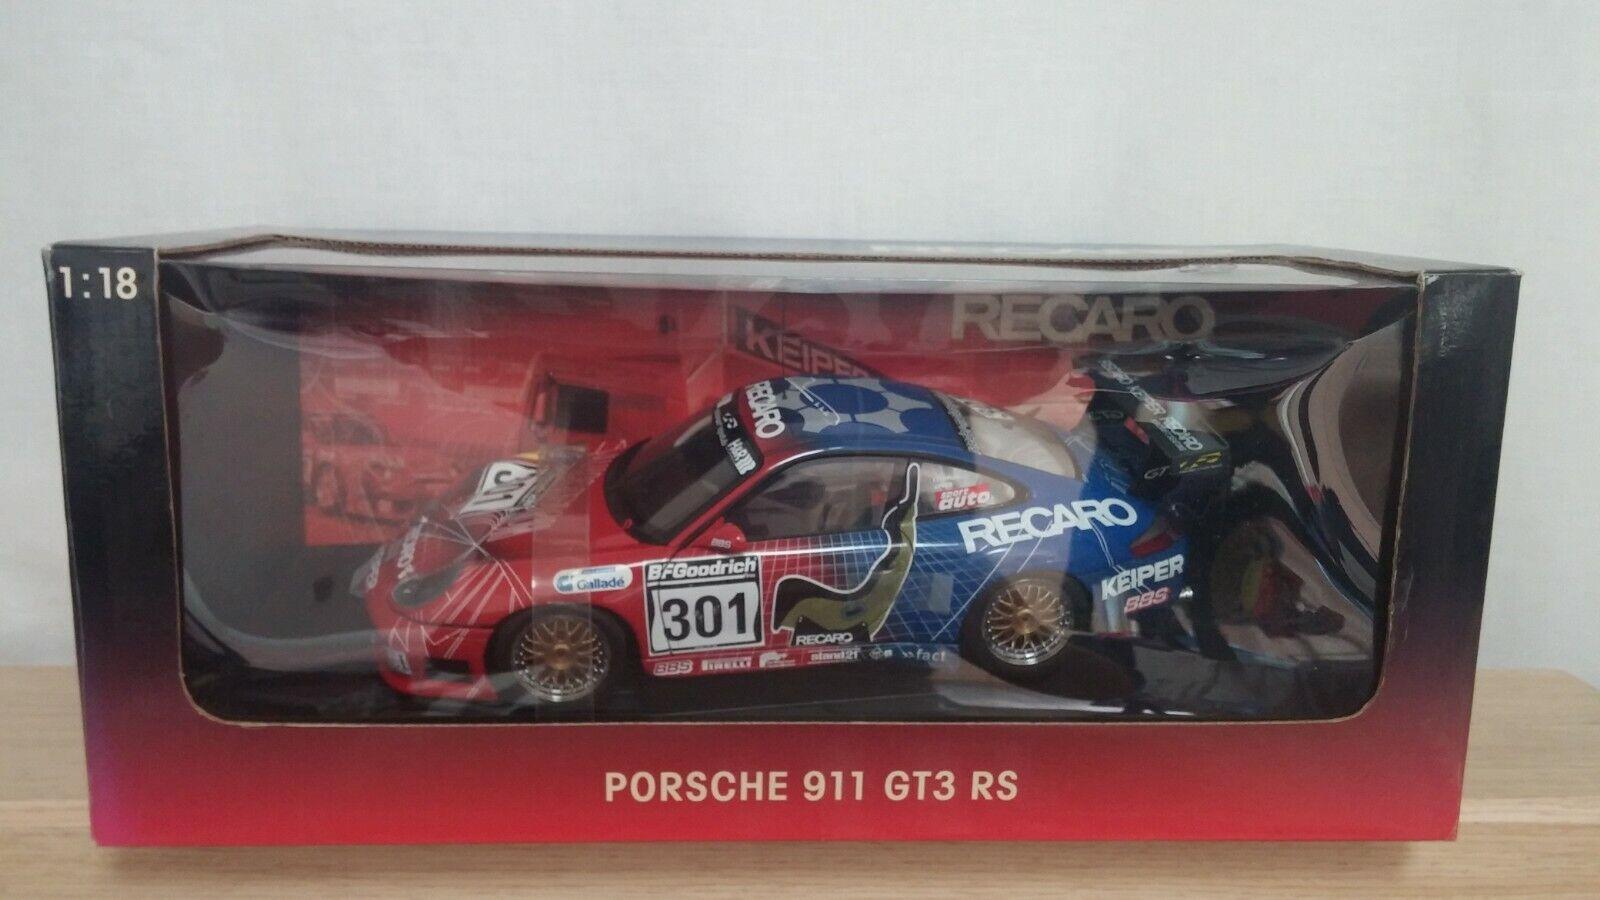 1 18 Autoart Porsche 911 996 GT3 RS recaro